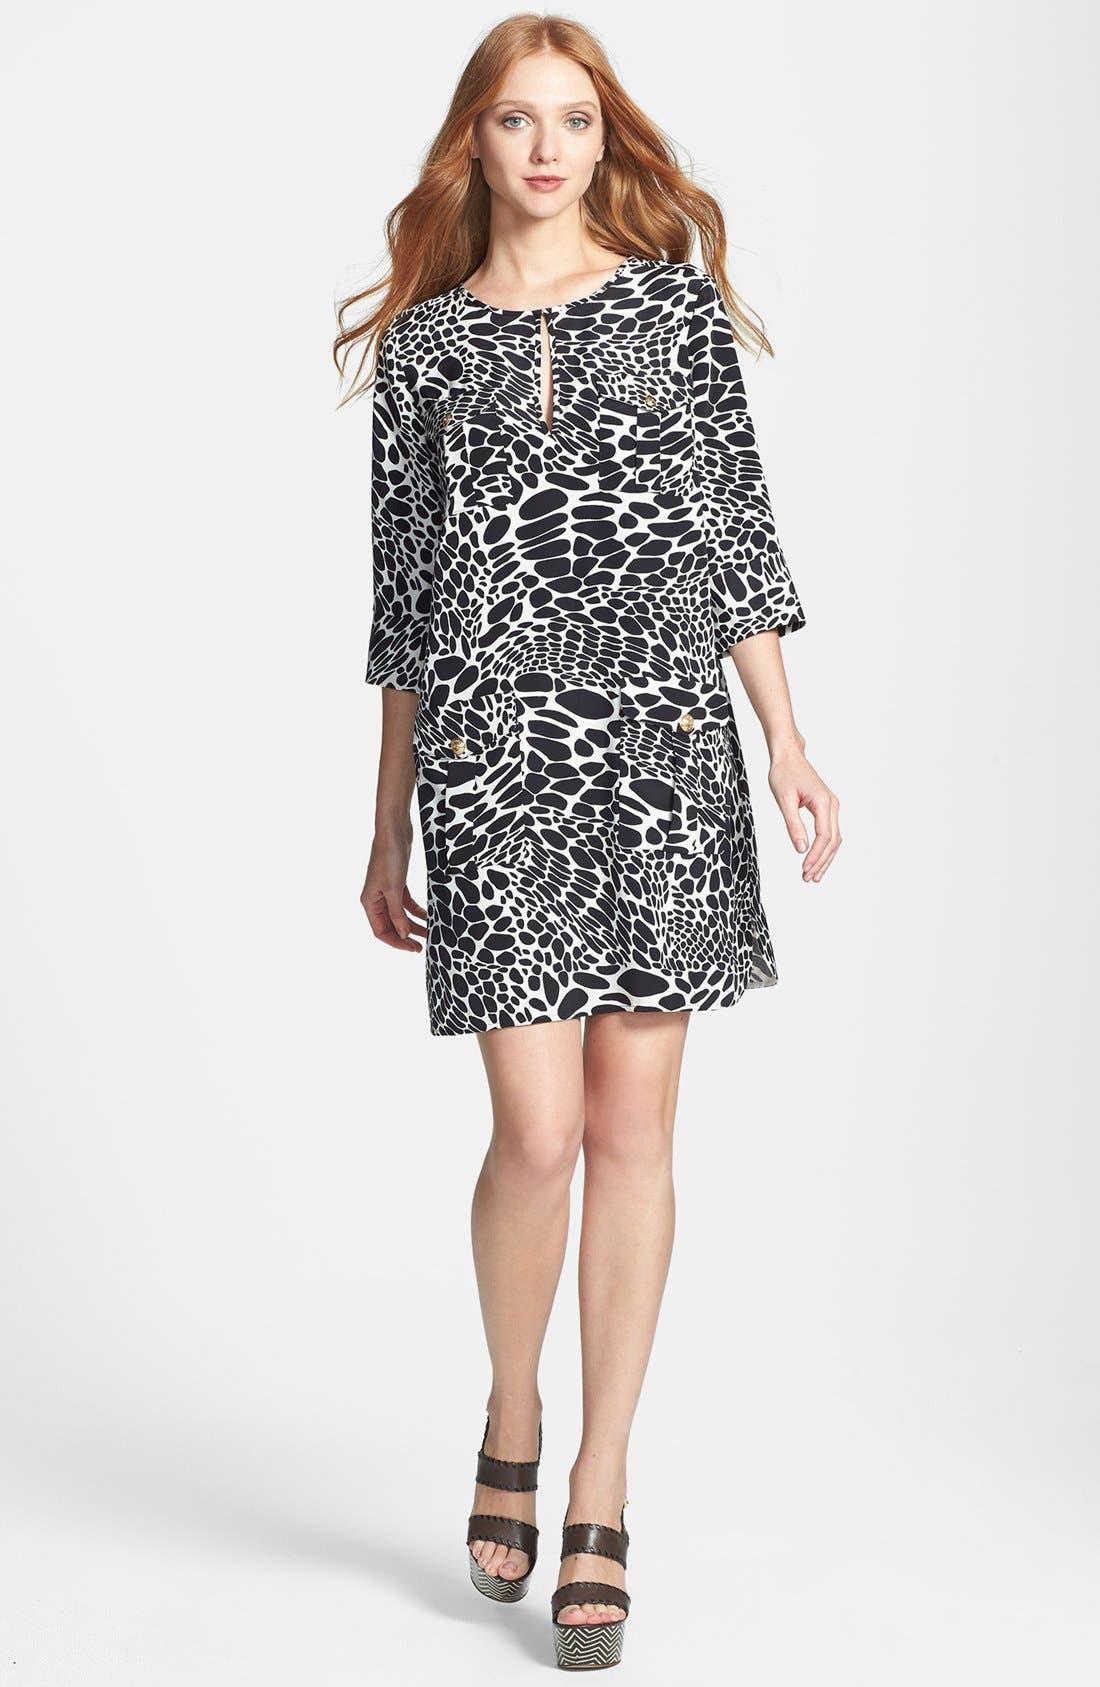 Alternate Image 1 Selected - Diane von Furstenberg 'Agness' Print Woven Shift Dress